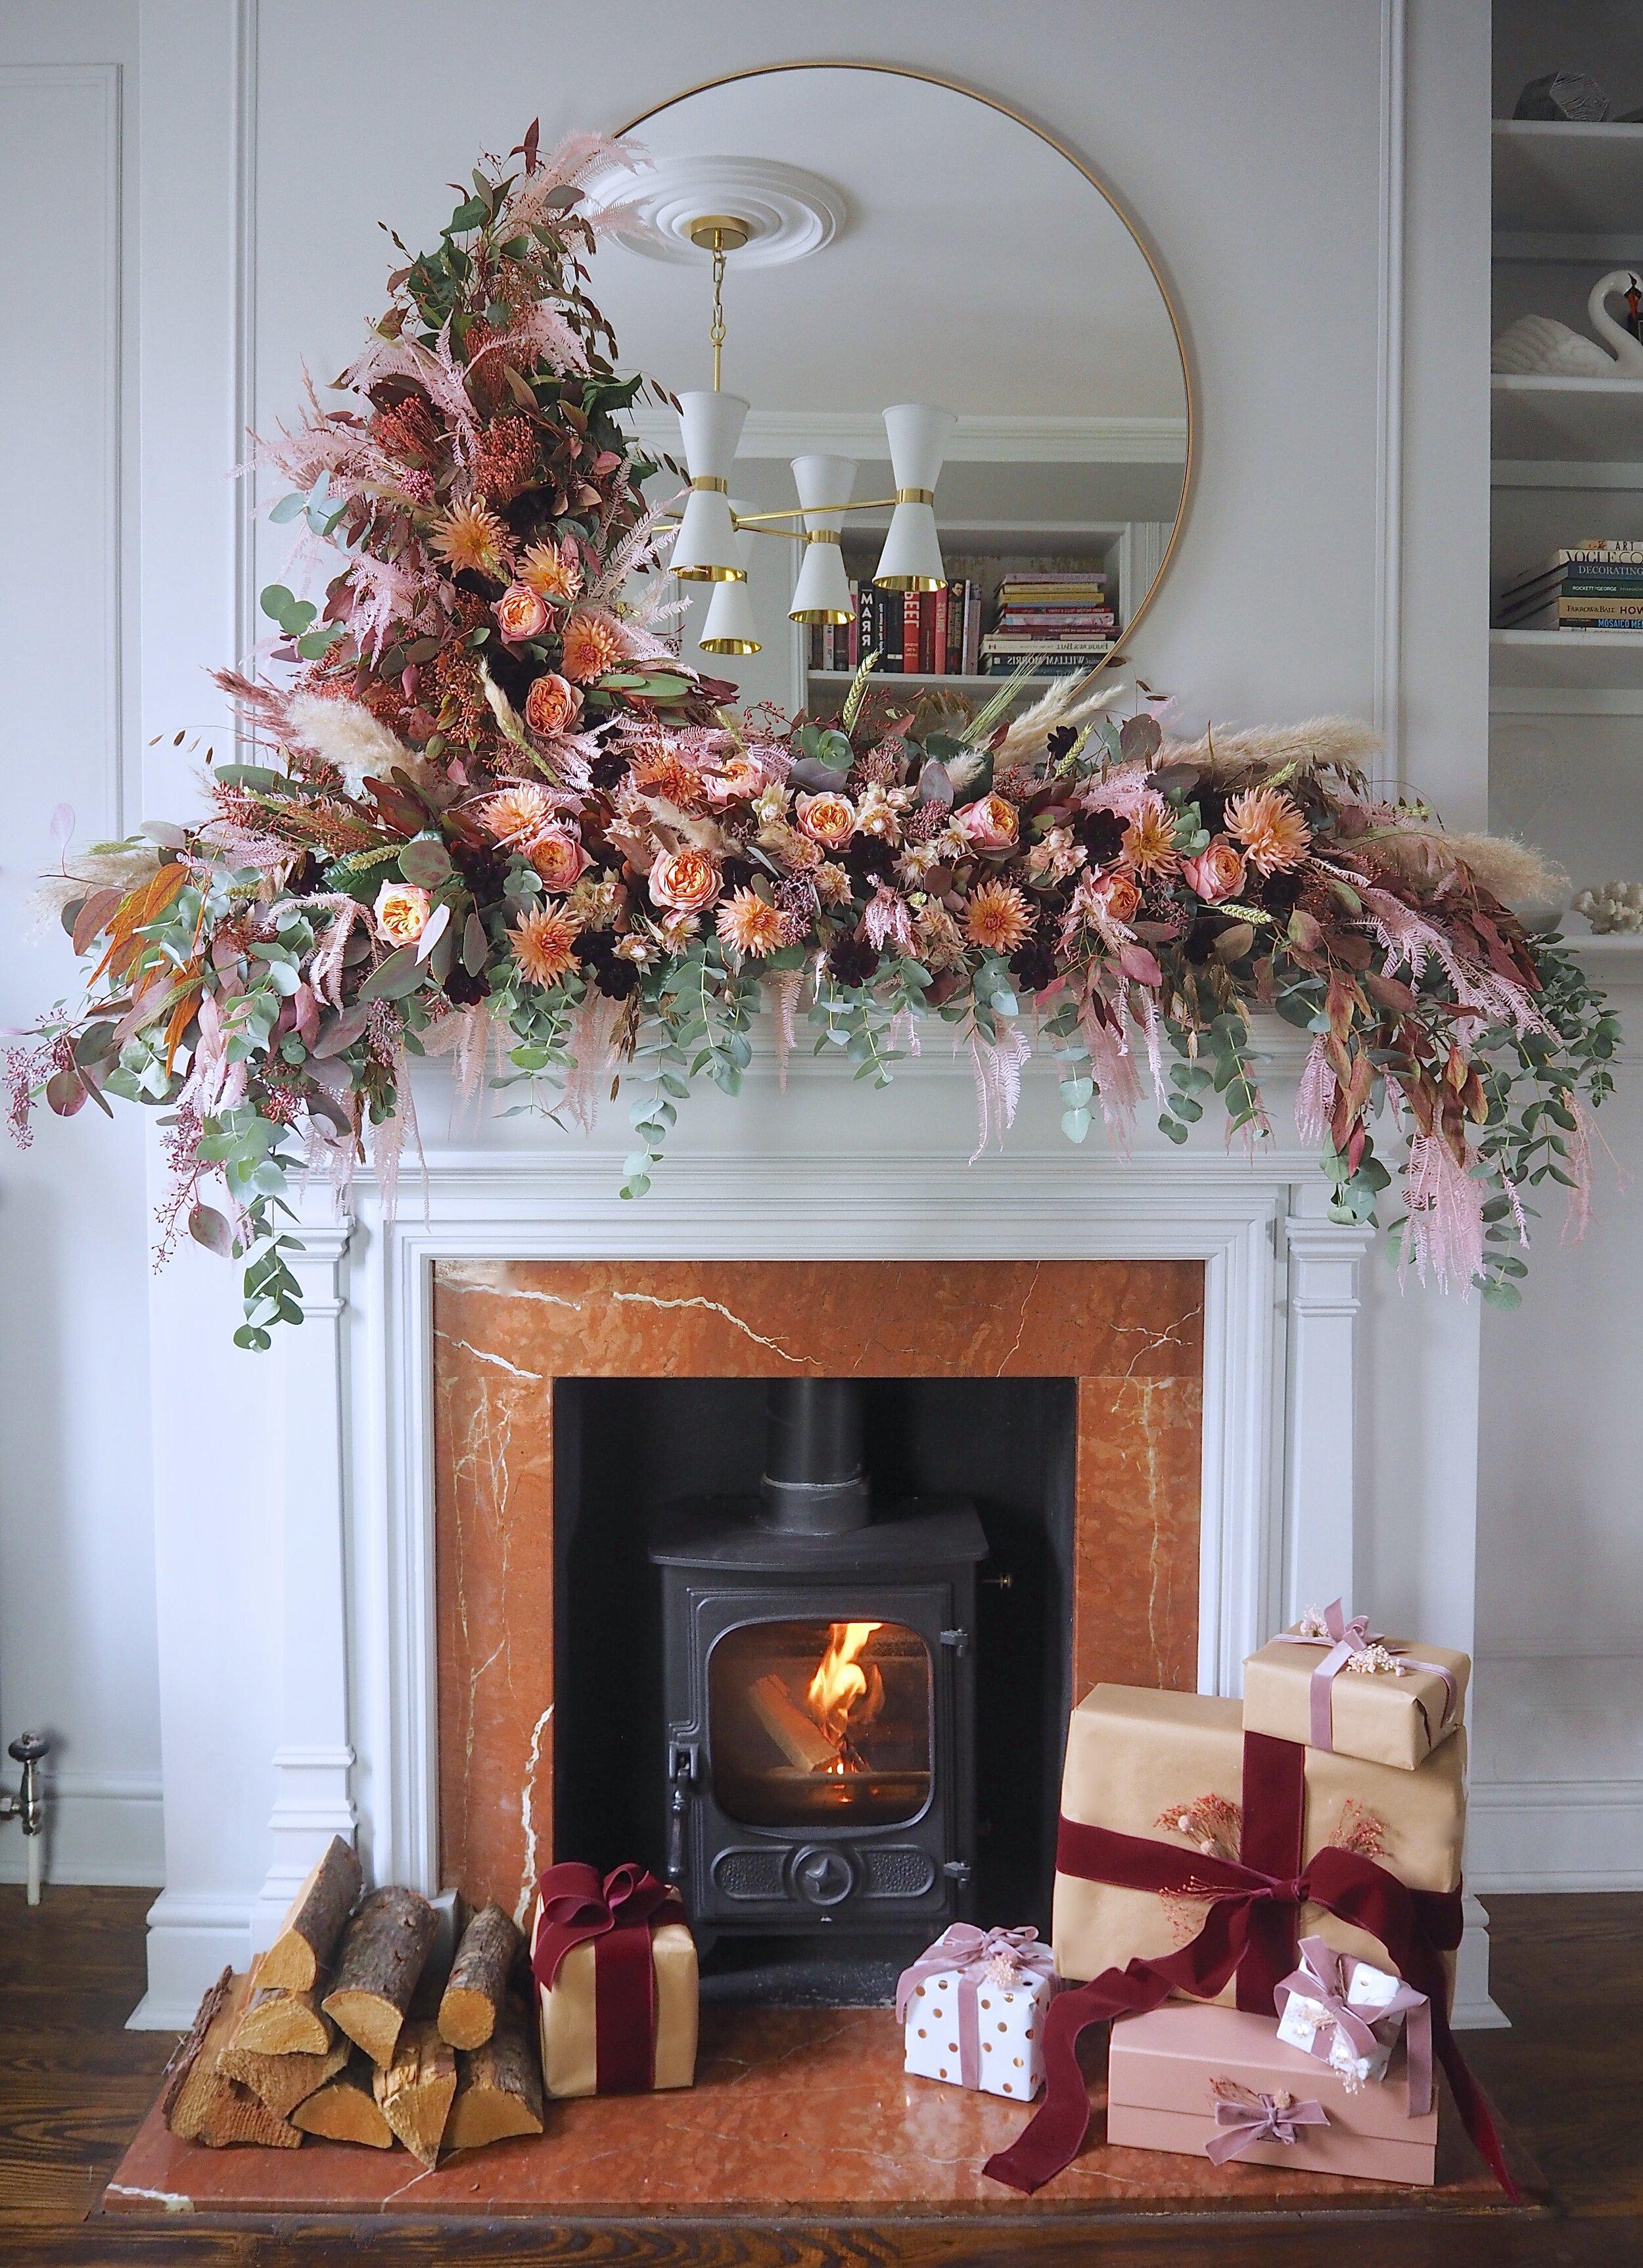 Christmas Fireplace Mantel Garland Ideas Melanie Lissack Interiors